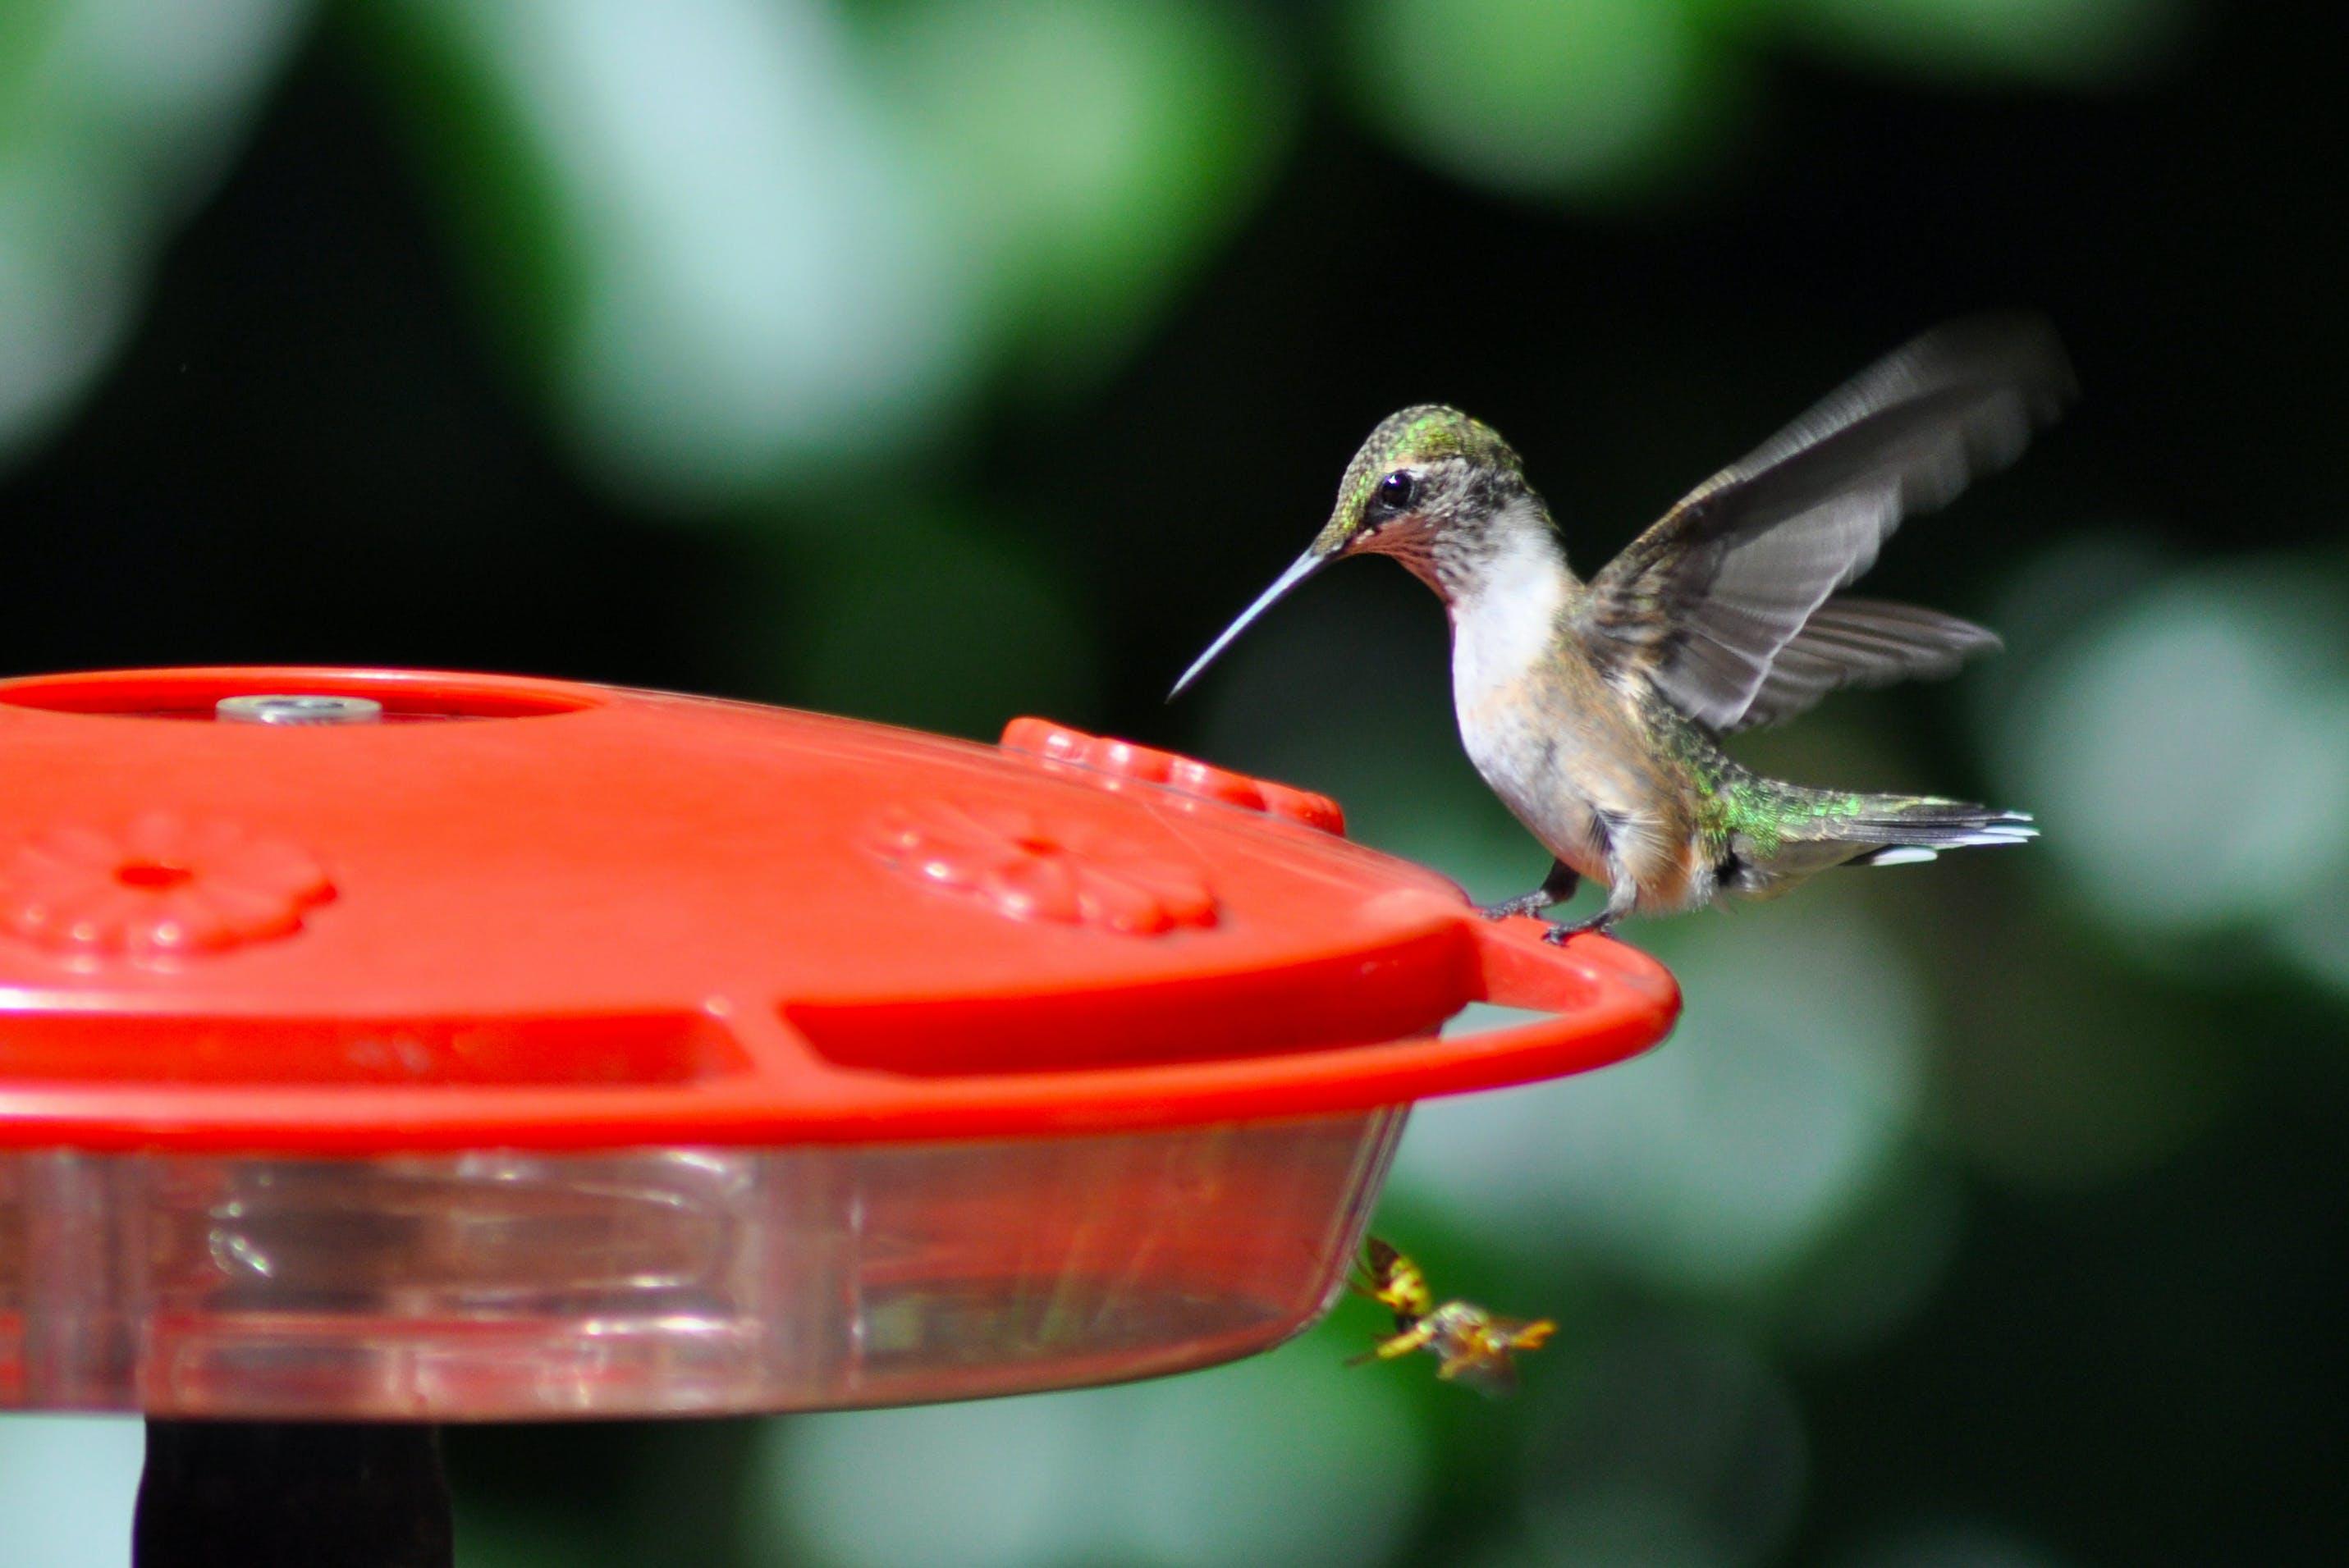 Green Bird on Red Bird Feeder in Bokeh Photography